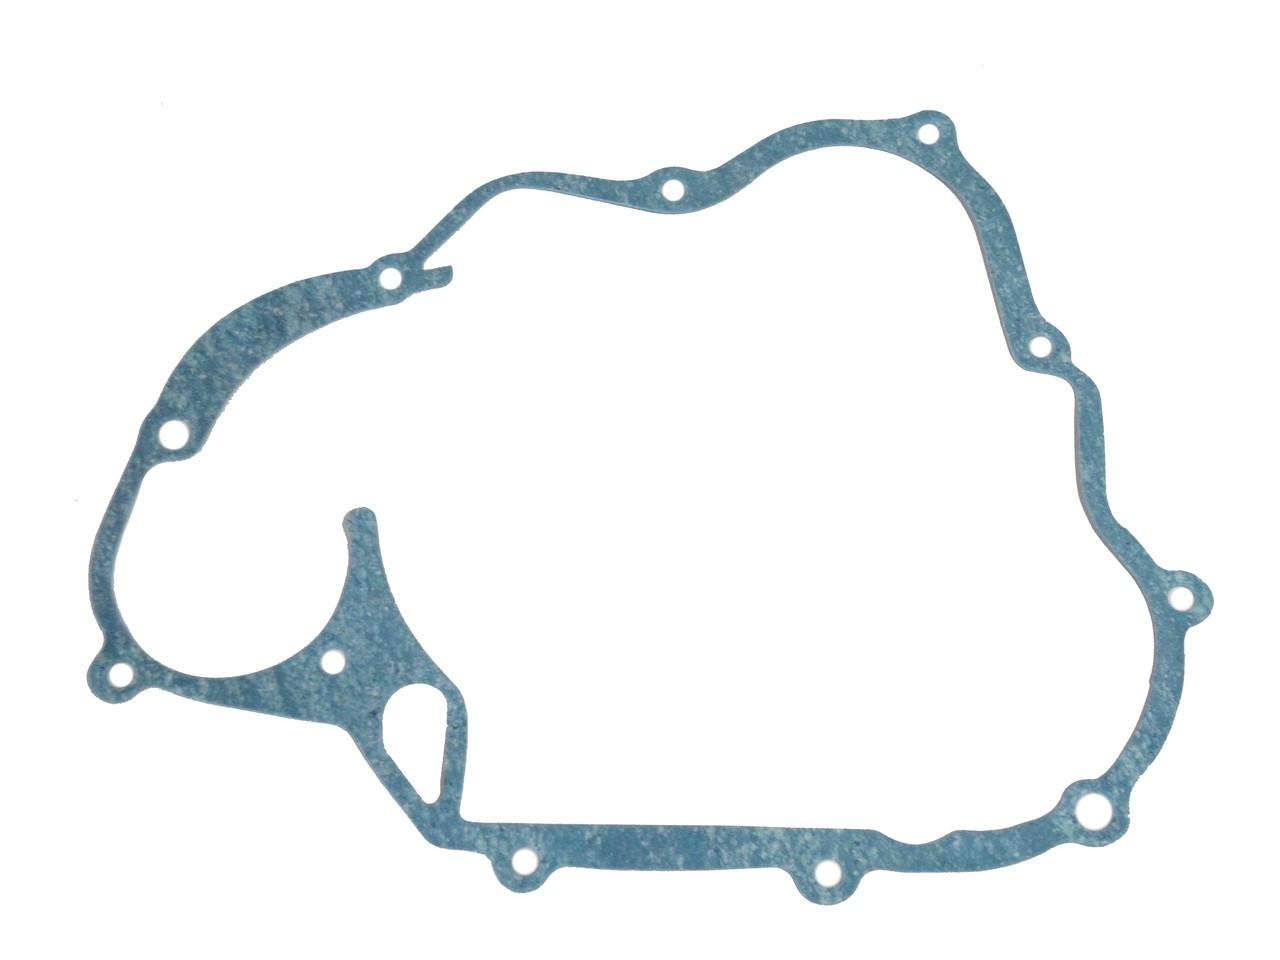 Honda Clutch Cover Gasket - MB5, MTX, NSR, CRM